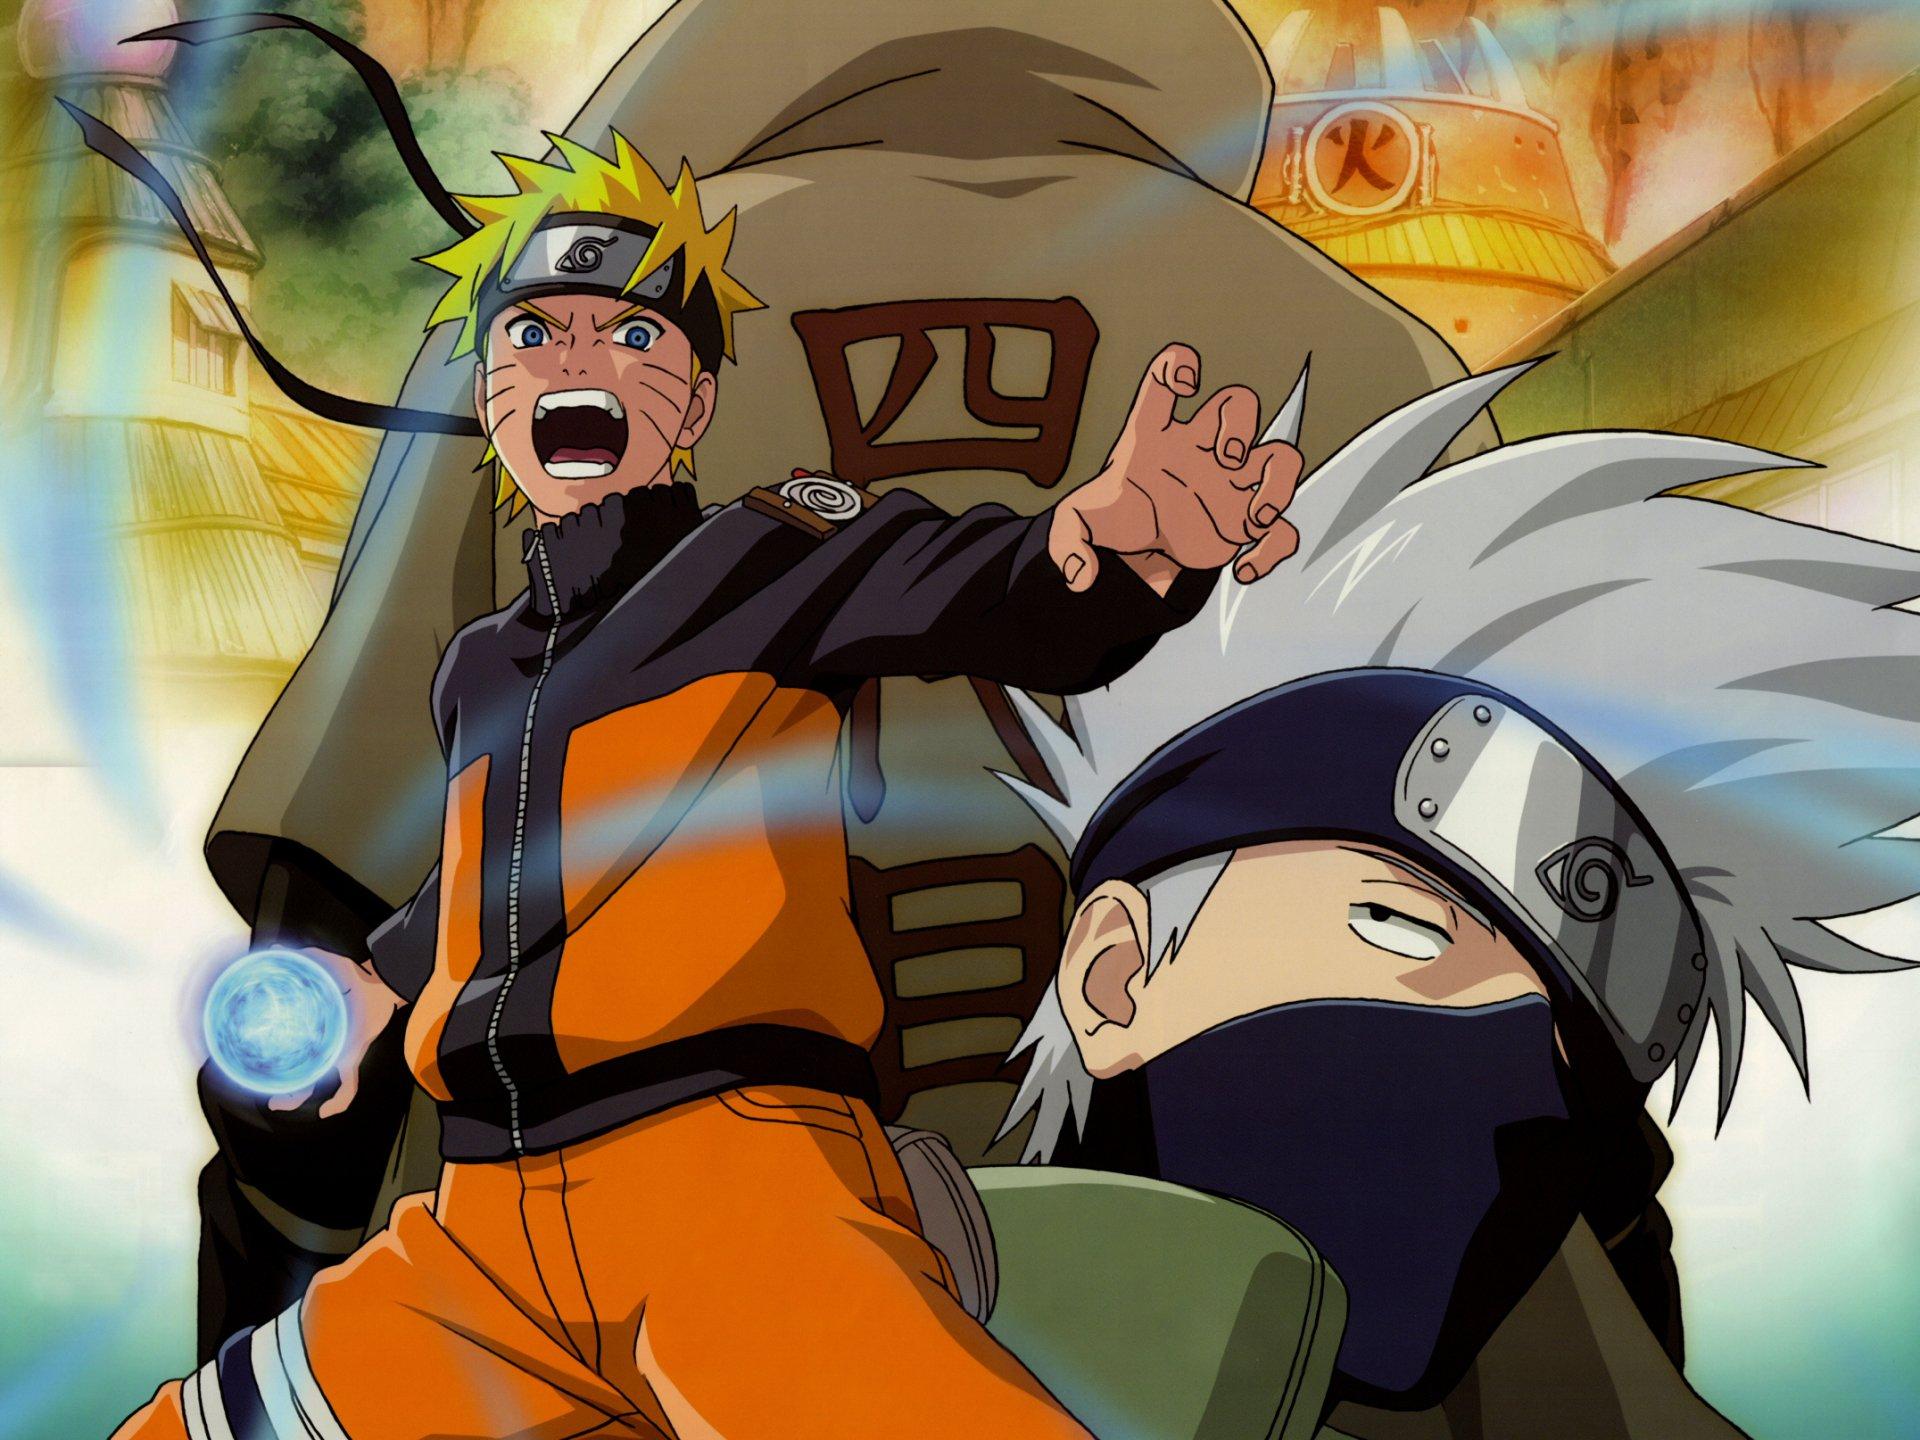 Naruto Full HD Fond d'écran and Arrière-Plan   2152x1614   ID:106868